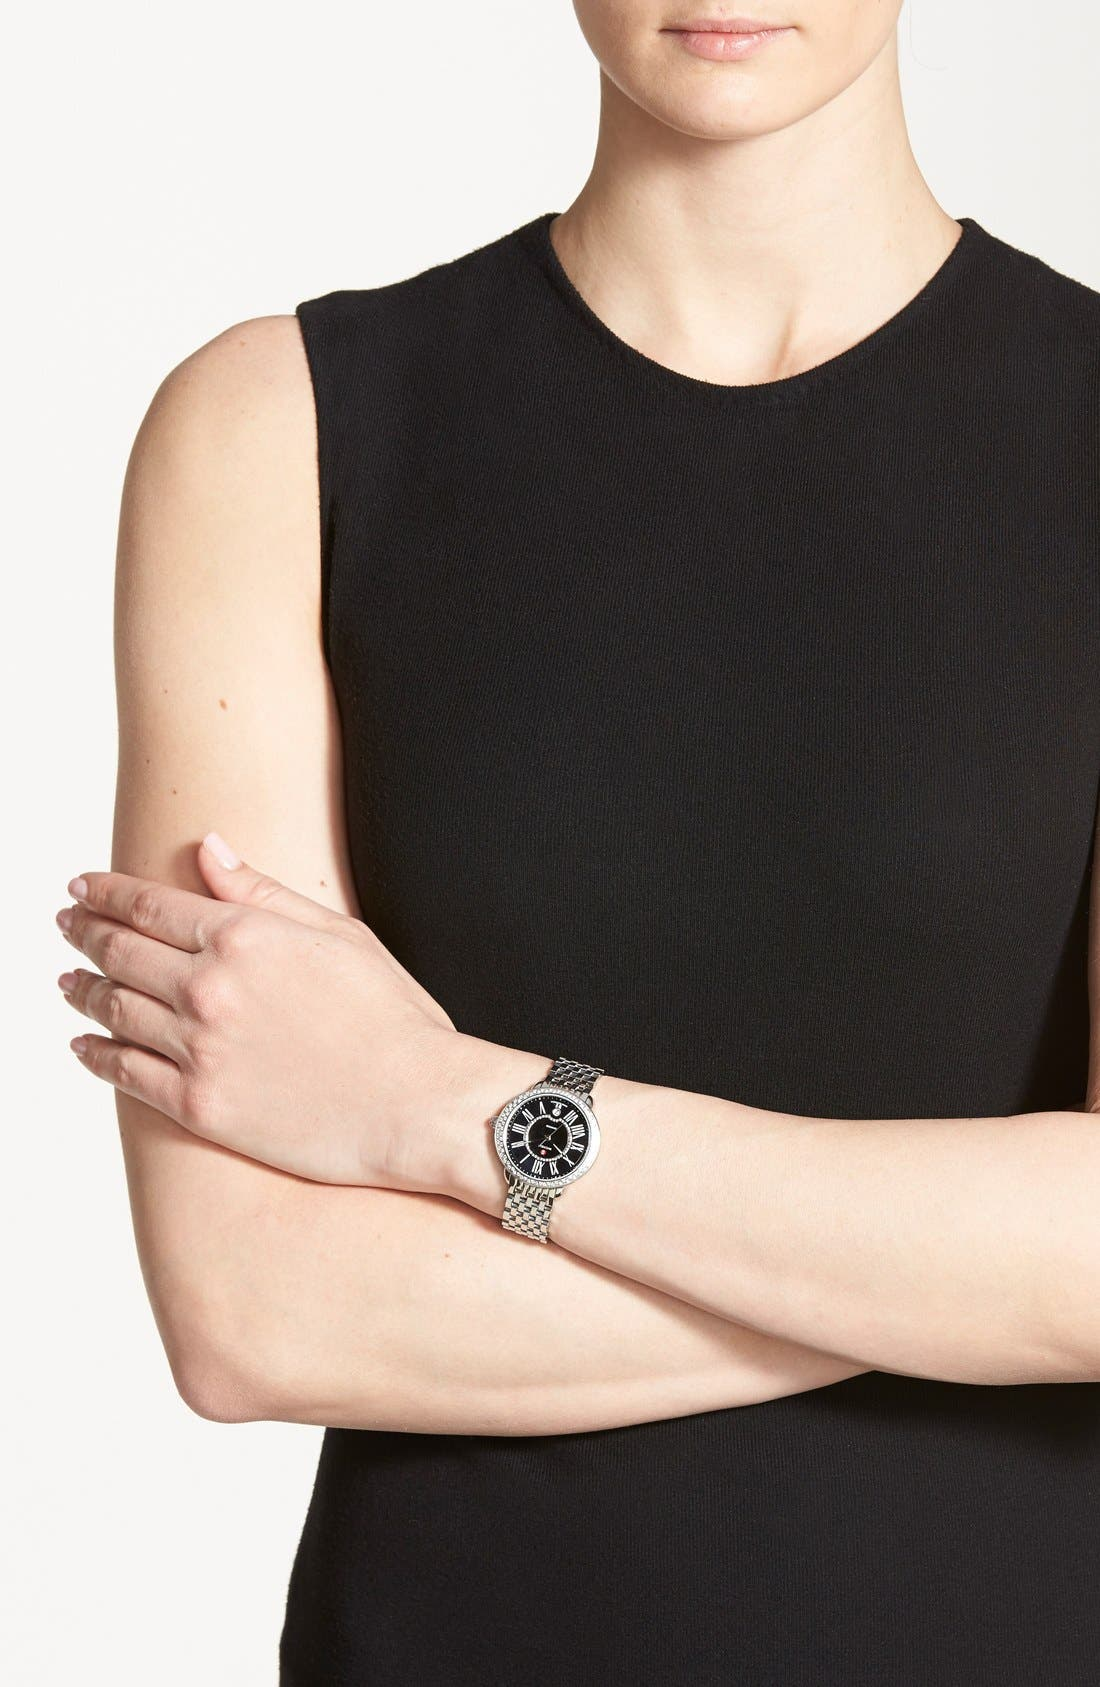 Serein 16 Diamond Watch Case, 34mm x 36mm,                             Alternate thumbnail 20, color,